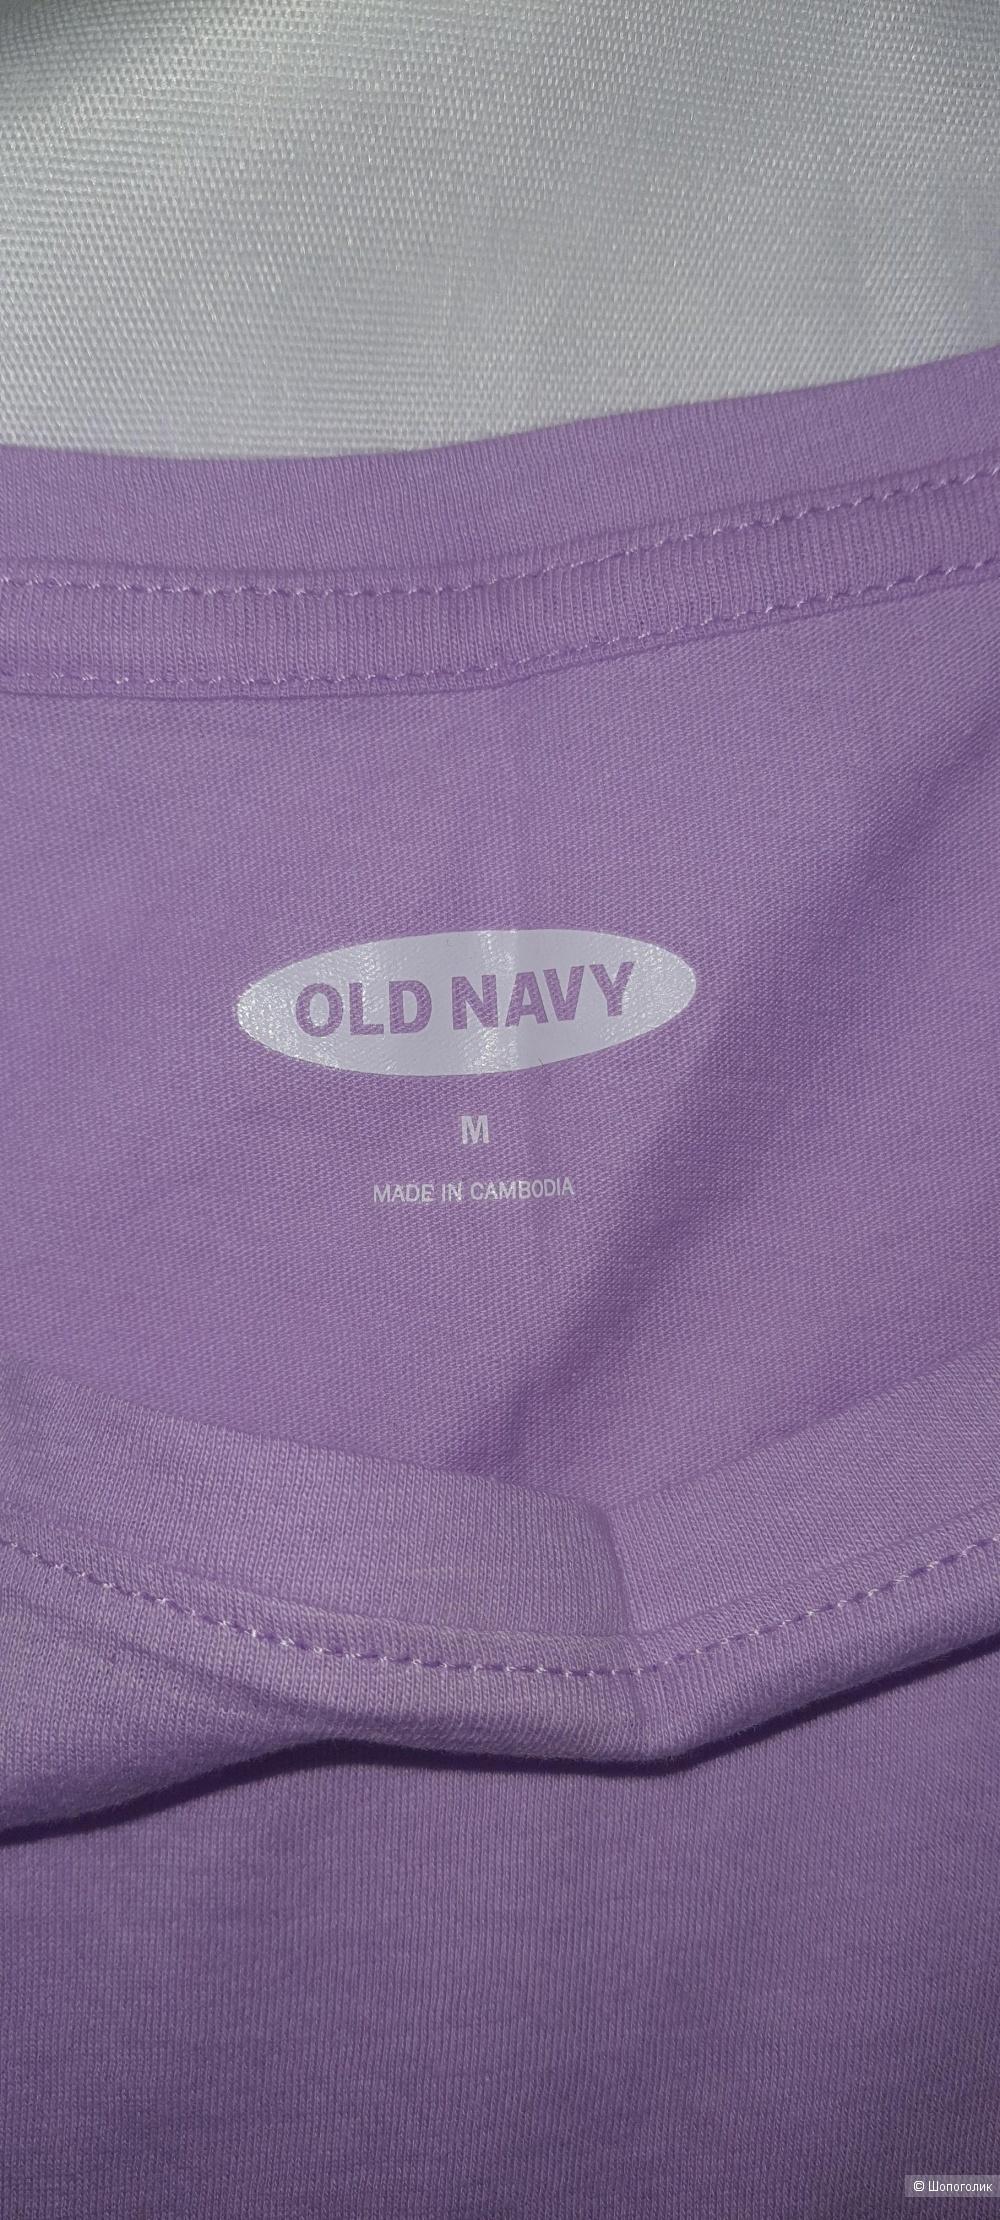 Топ Old navy  размер М